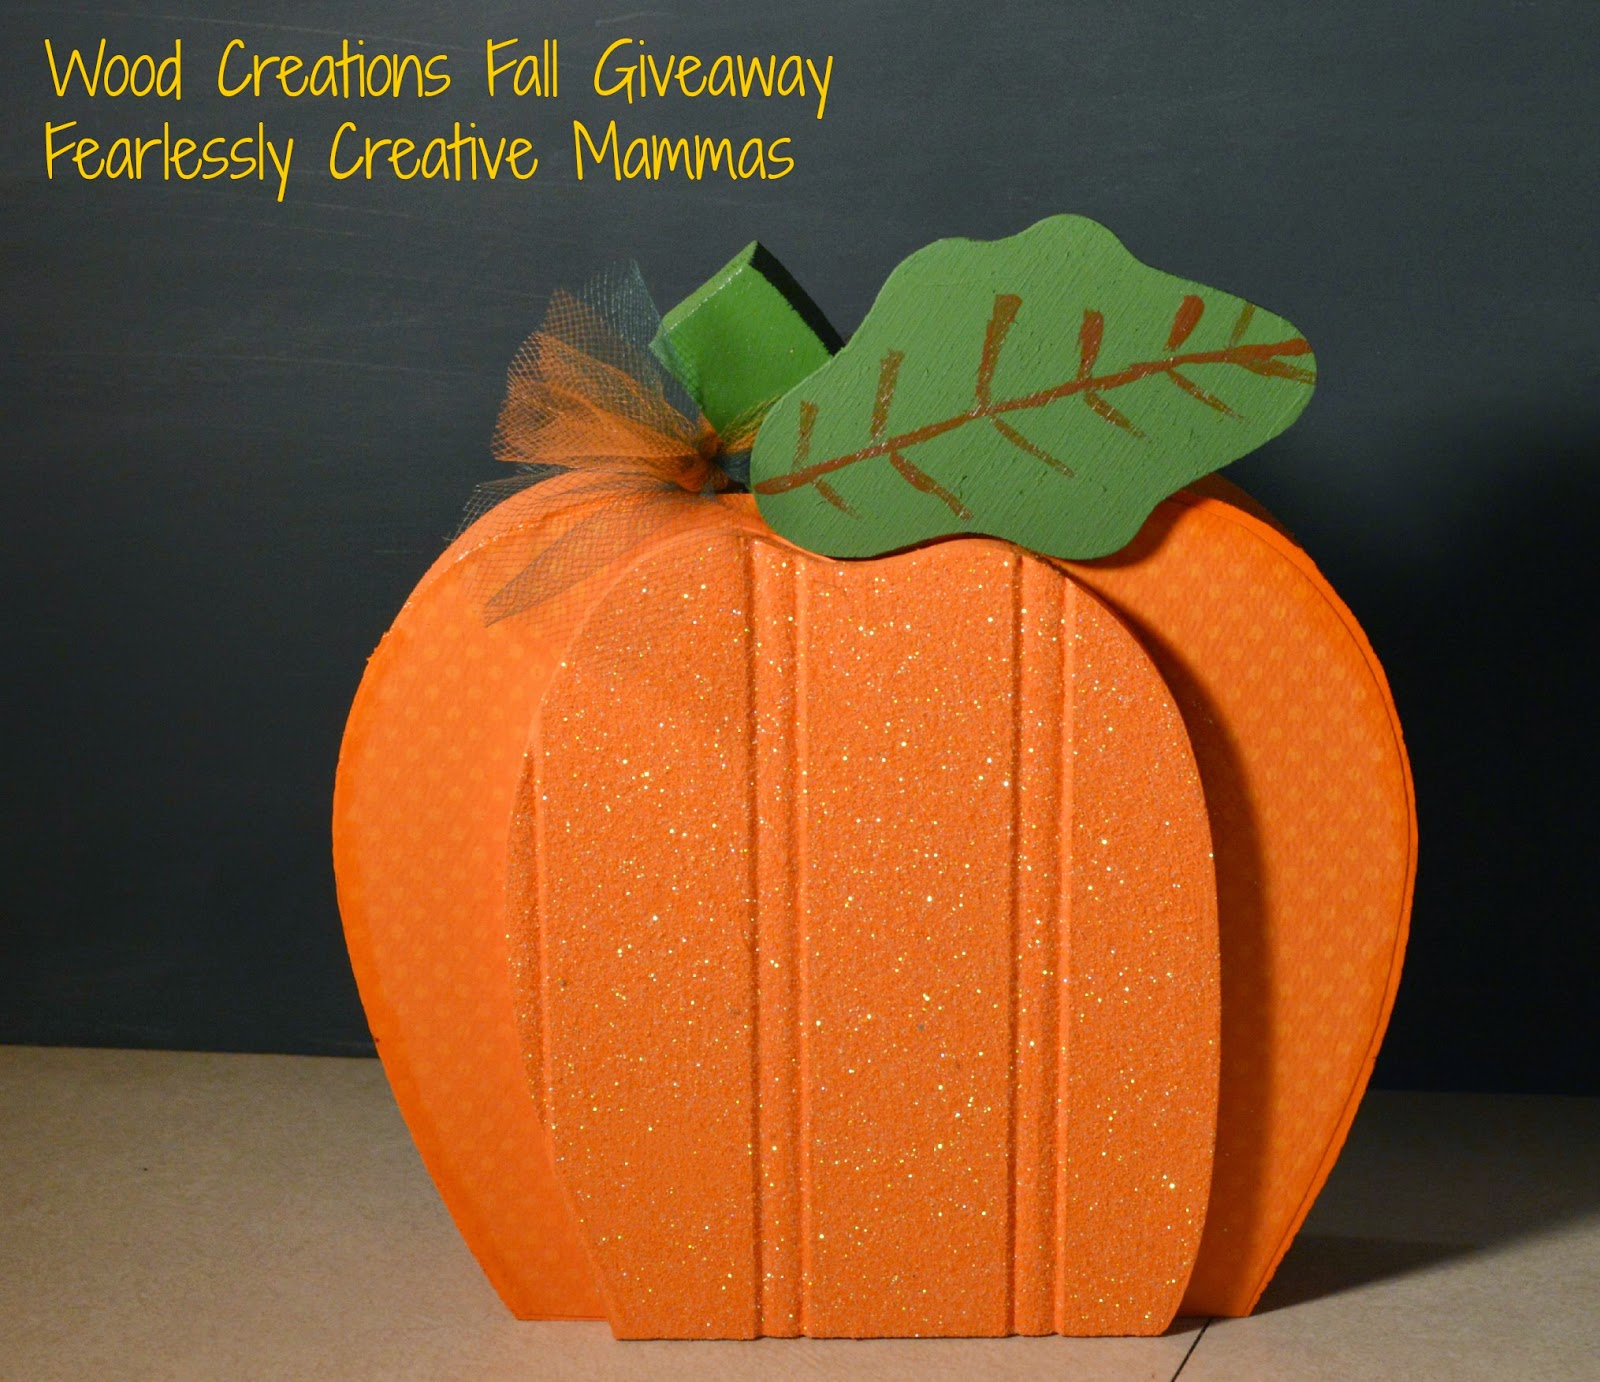 Fall Pumpkin Decorations Plus a Giveaway